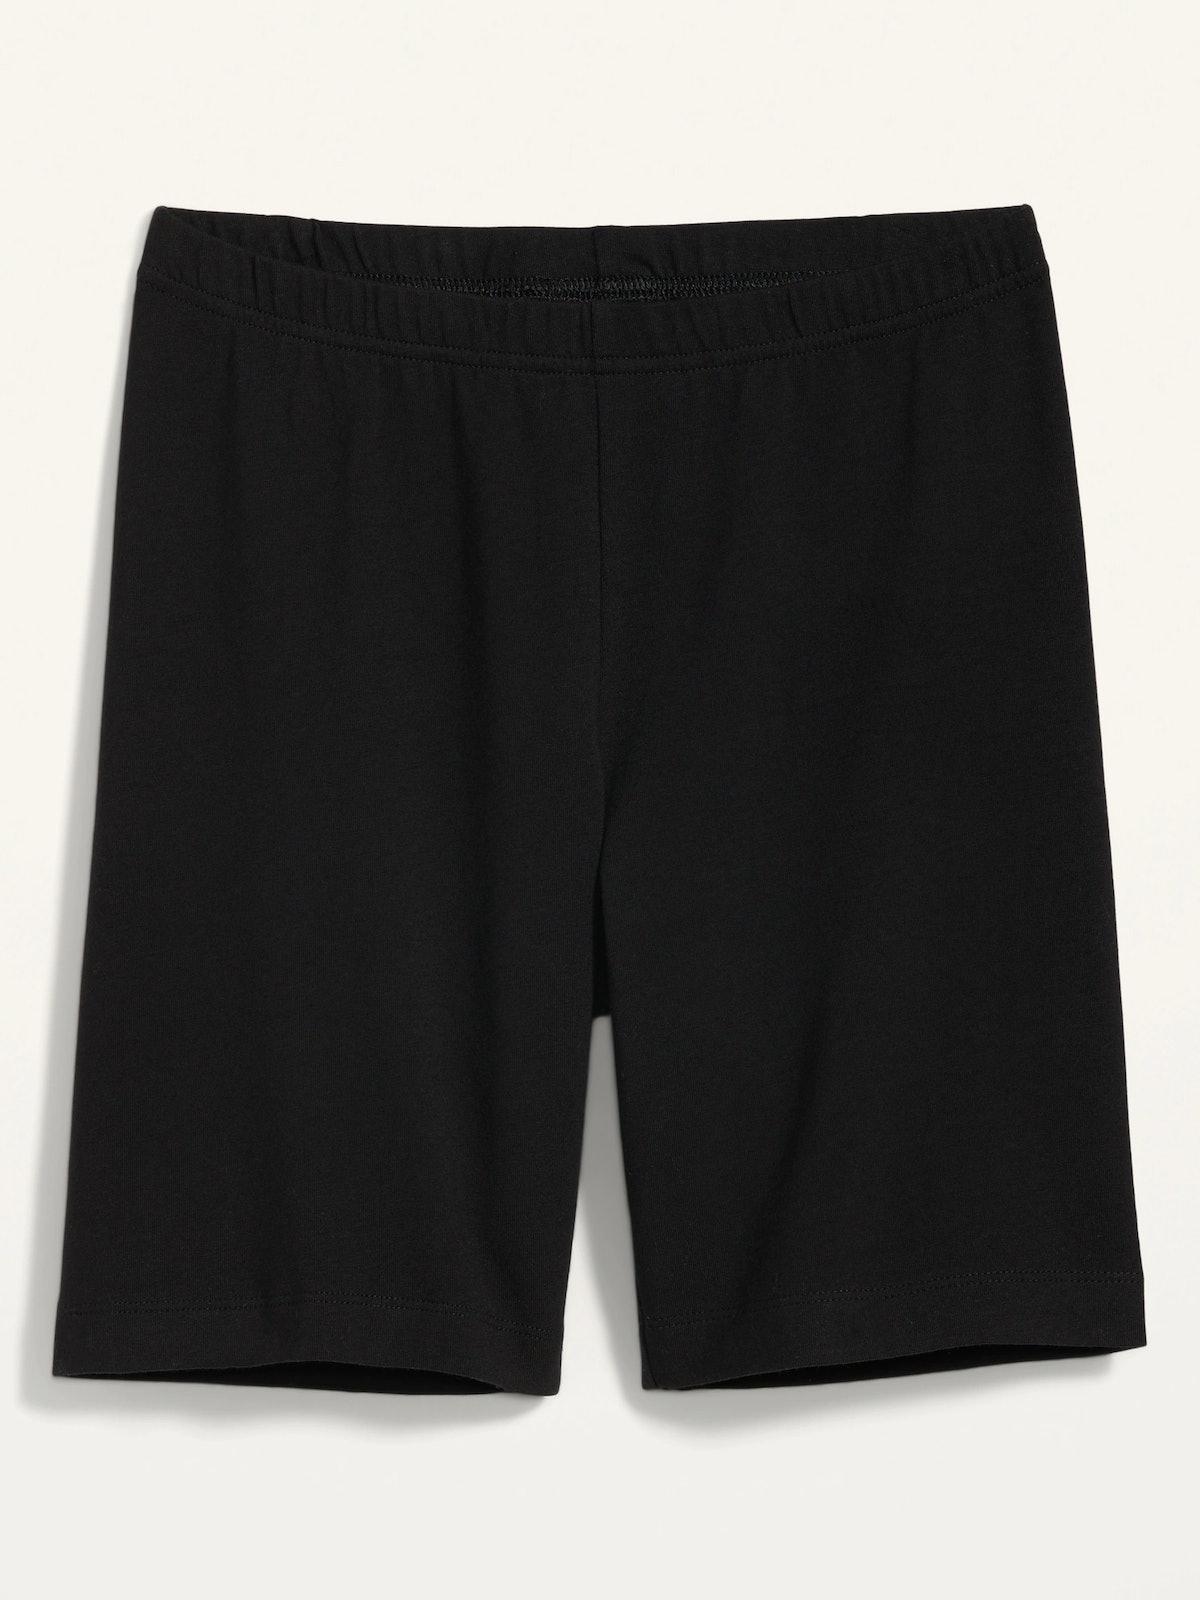 Old Navy High-Waisted Jersey Bike Shorts